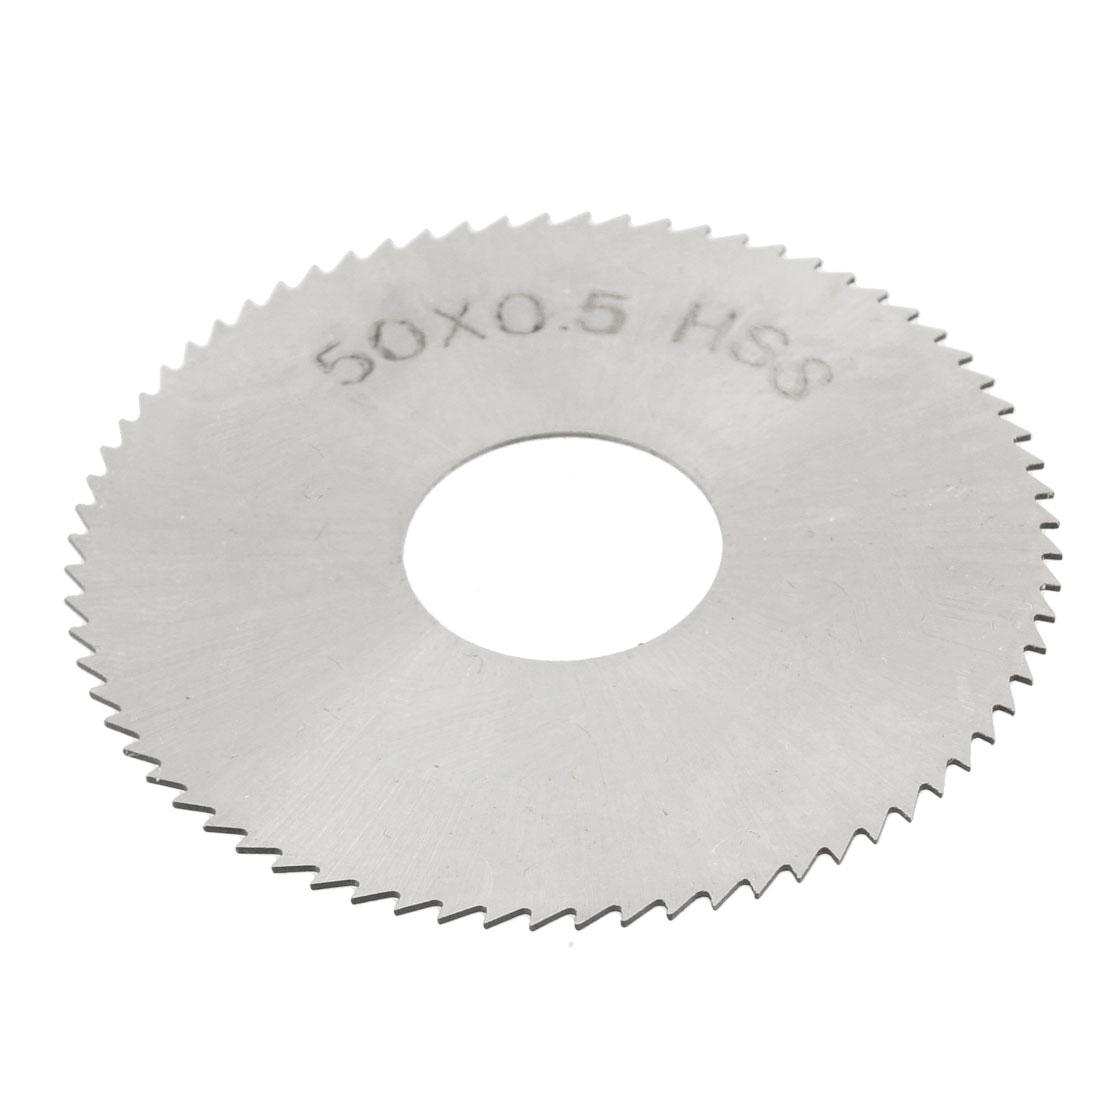 50mm OD 0.5mm Thick 72T HSS Circular Slitting Saw Cutter